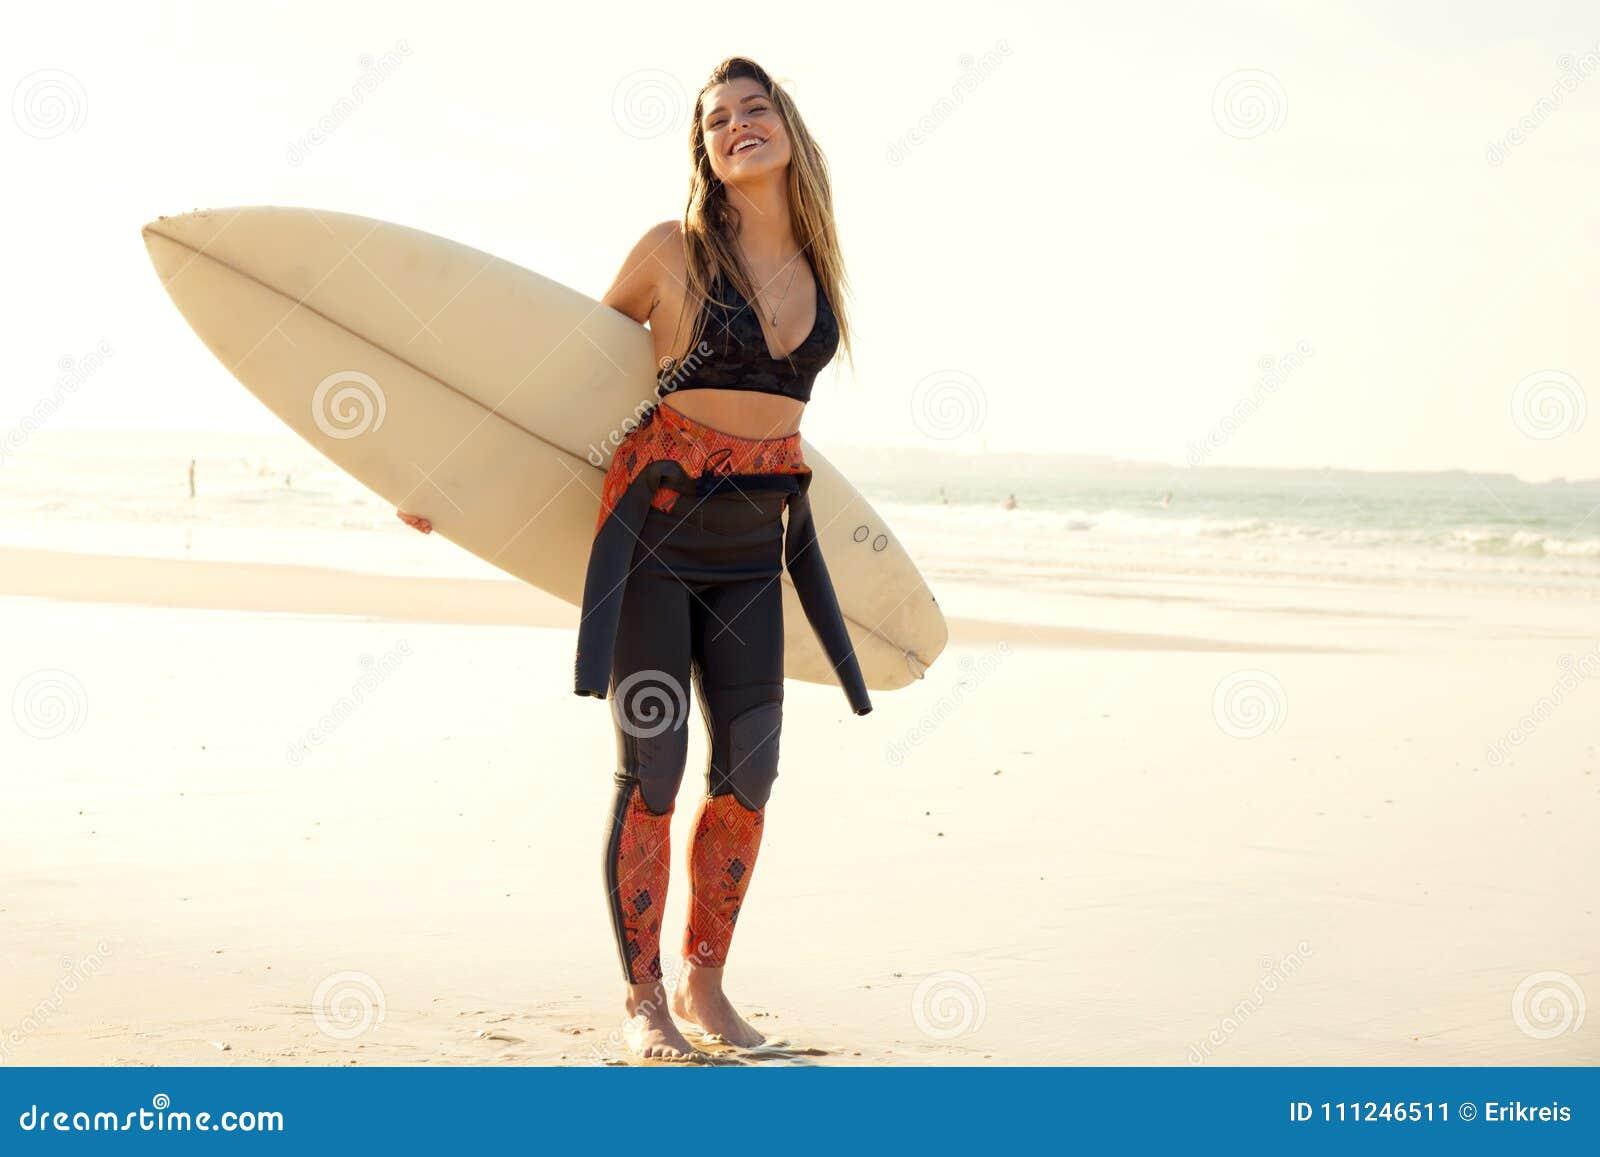 Bikini love love surf apologise